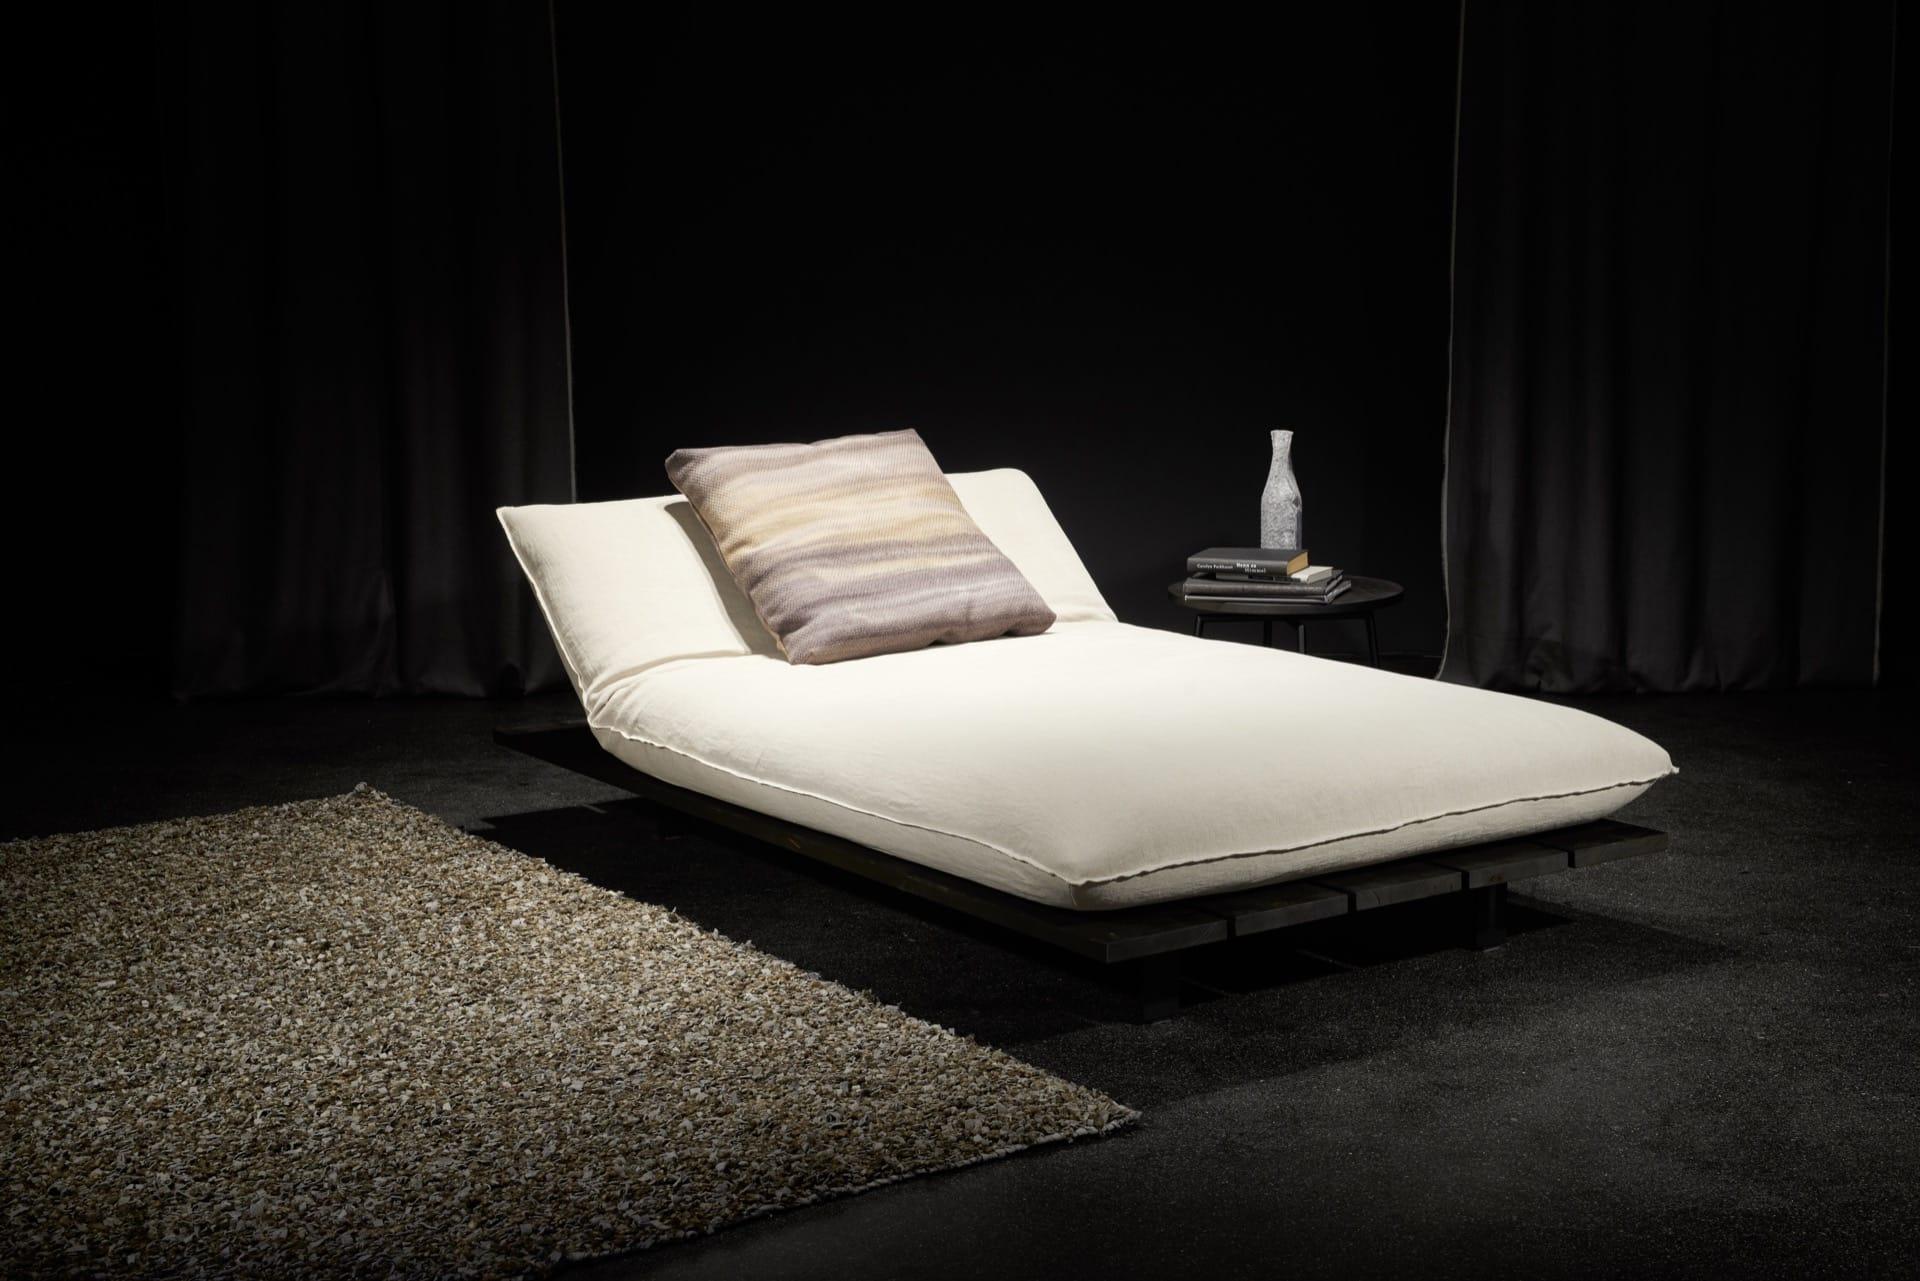 couchzone - Interior Design Innsbruck - bullfrog akito